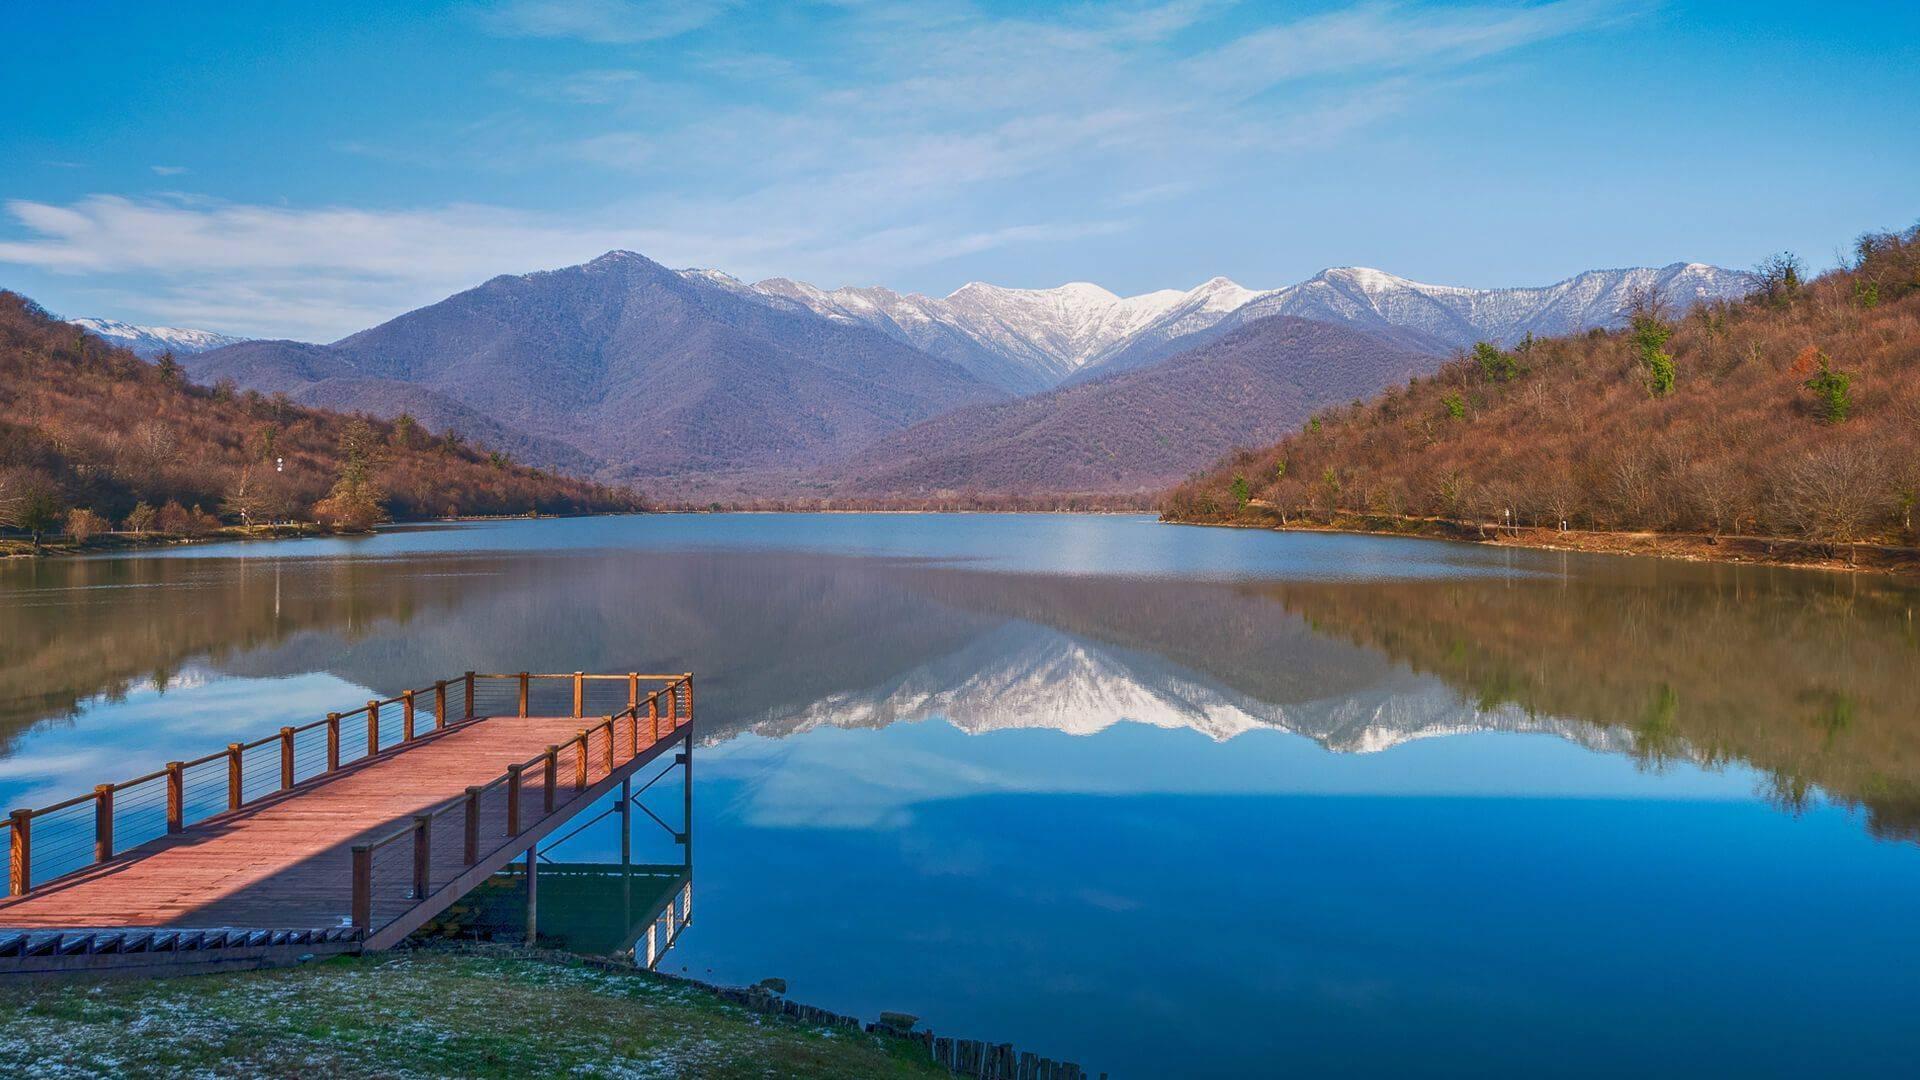 Озеро паравани – крупнейшее и красивейшее озеро грузии